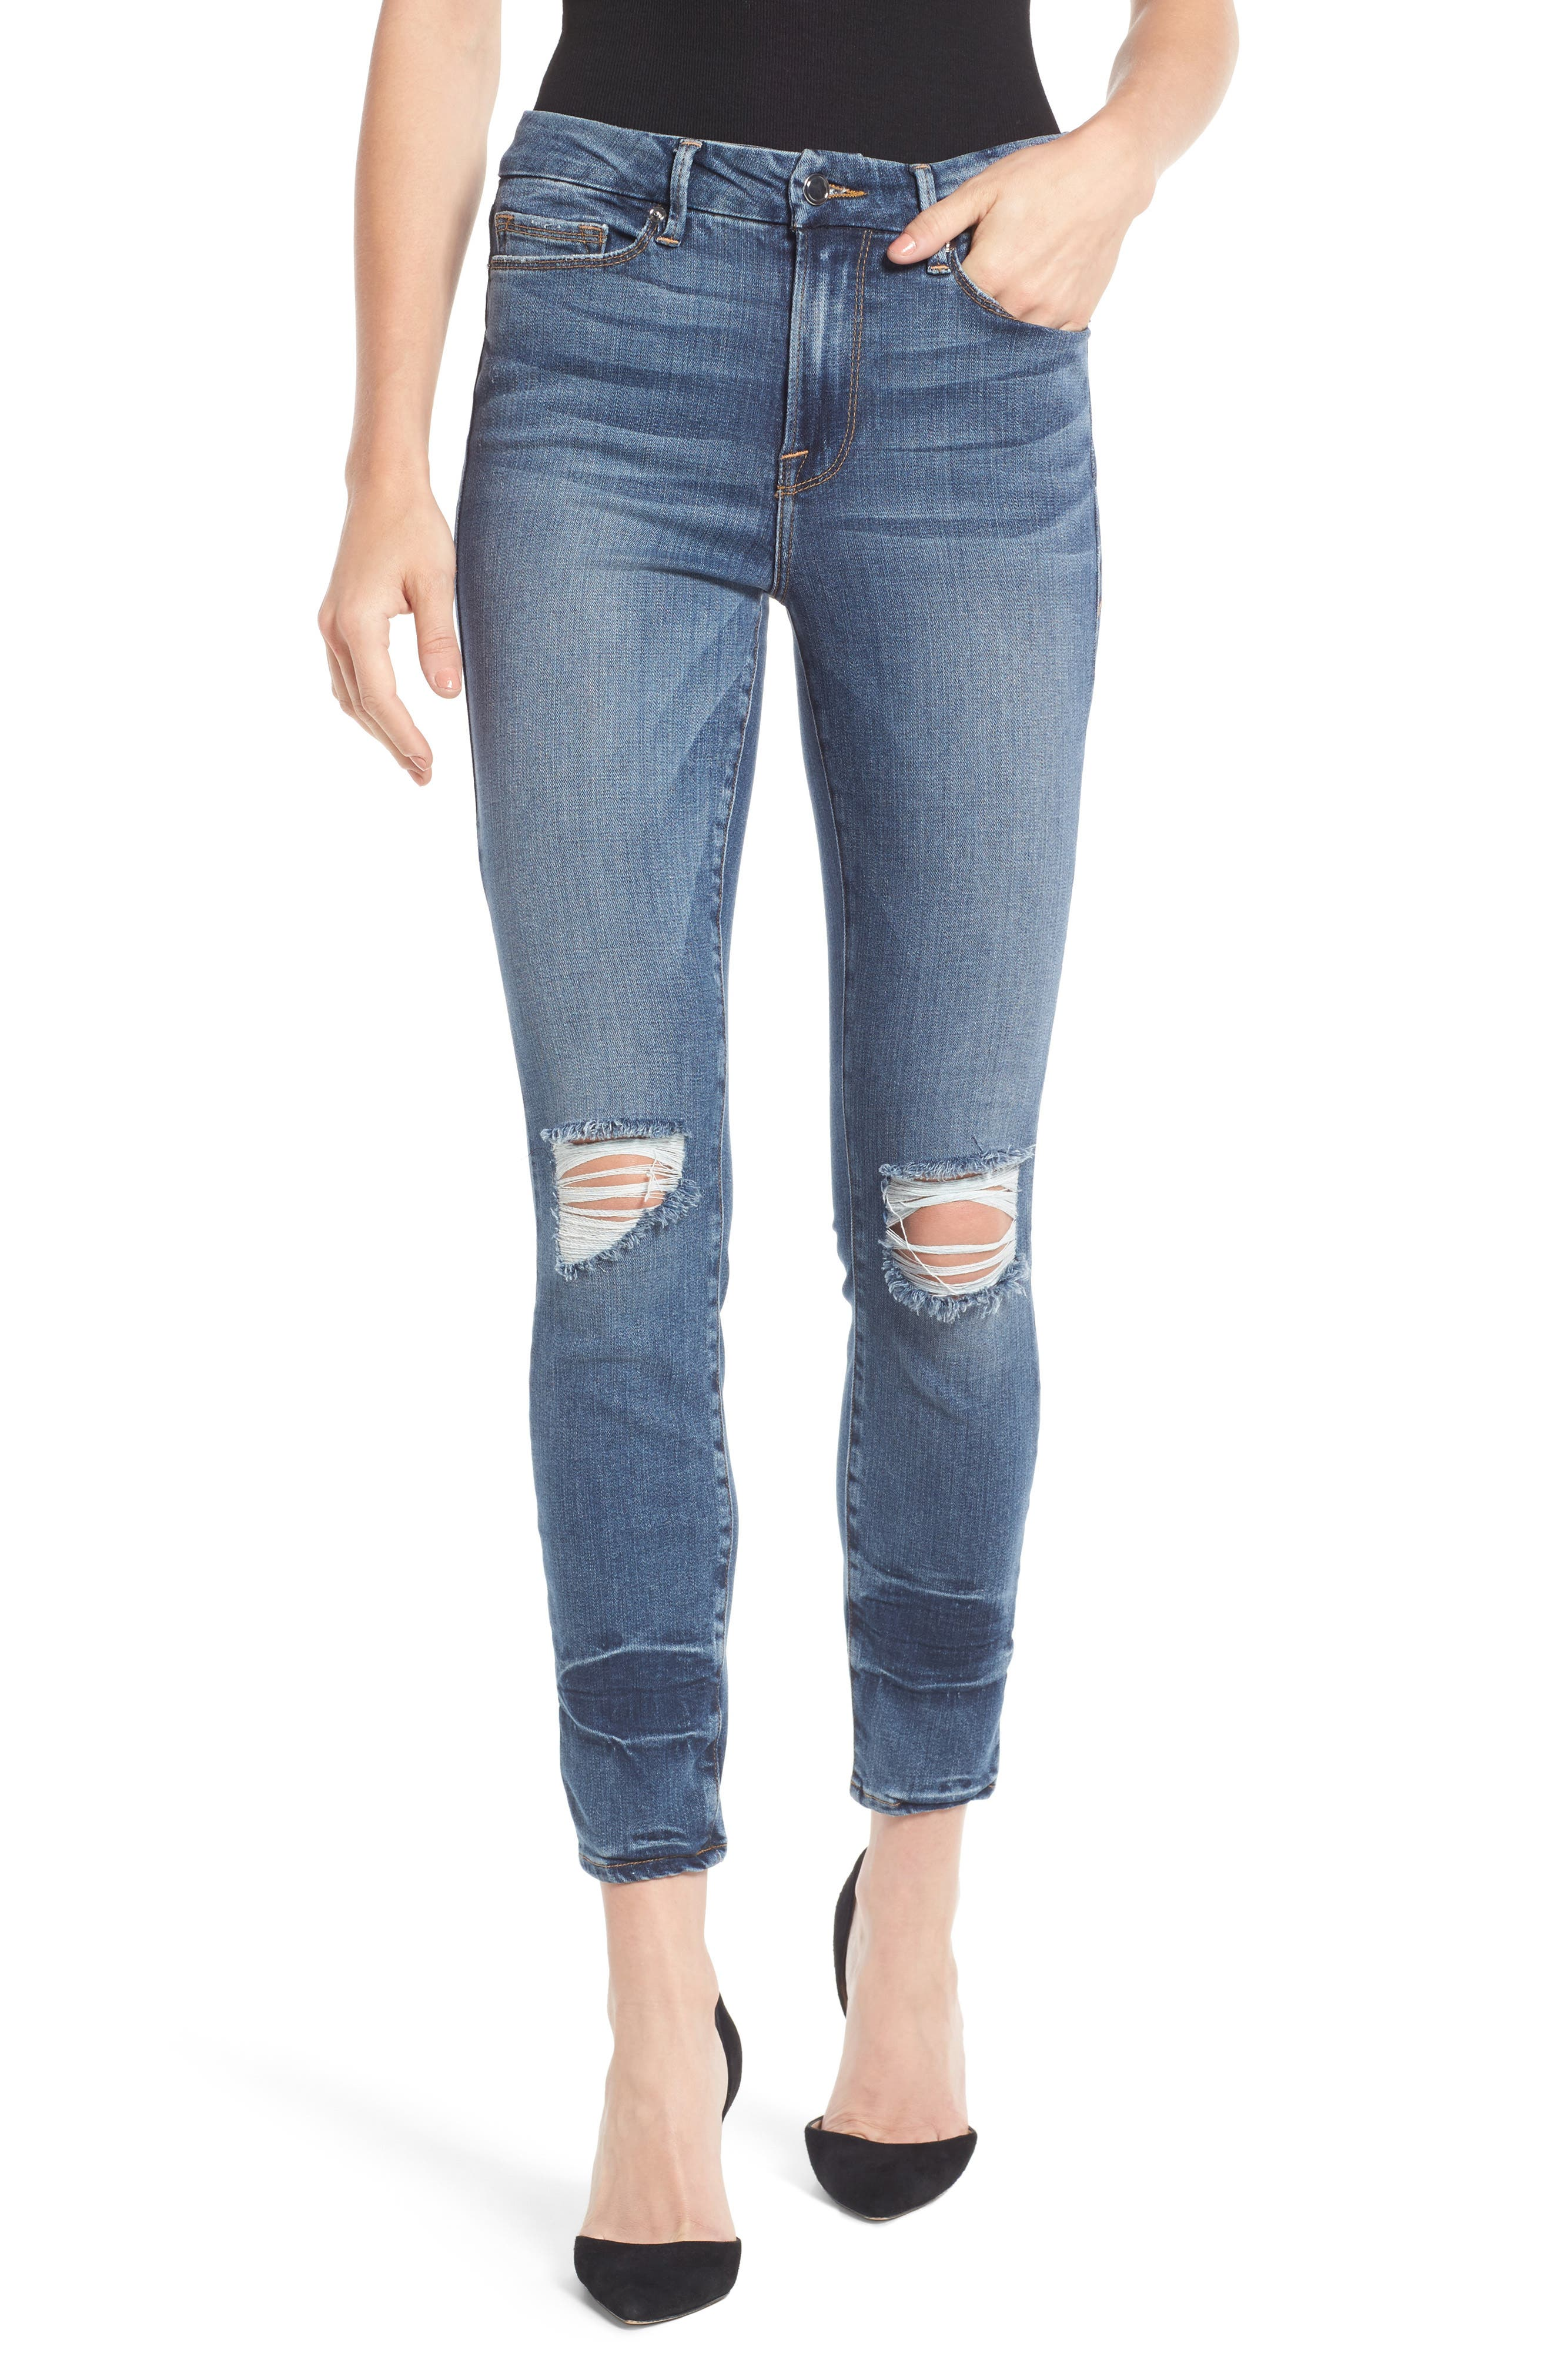 Alternate Image 1 Selected - Good American Good Legs High Waist Ankle Skinny Jeans (Blue 084) (Regular & Plus Size)